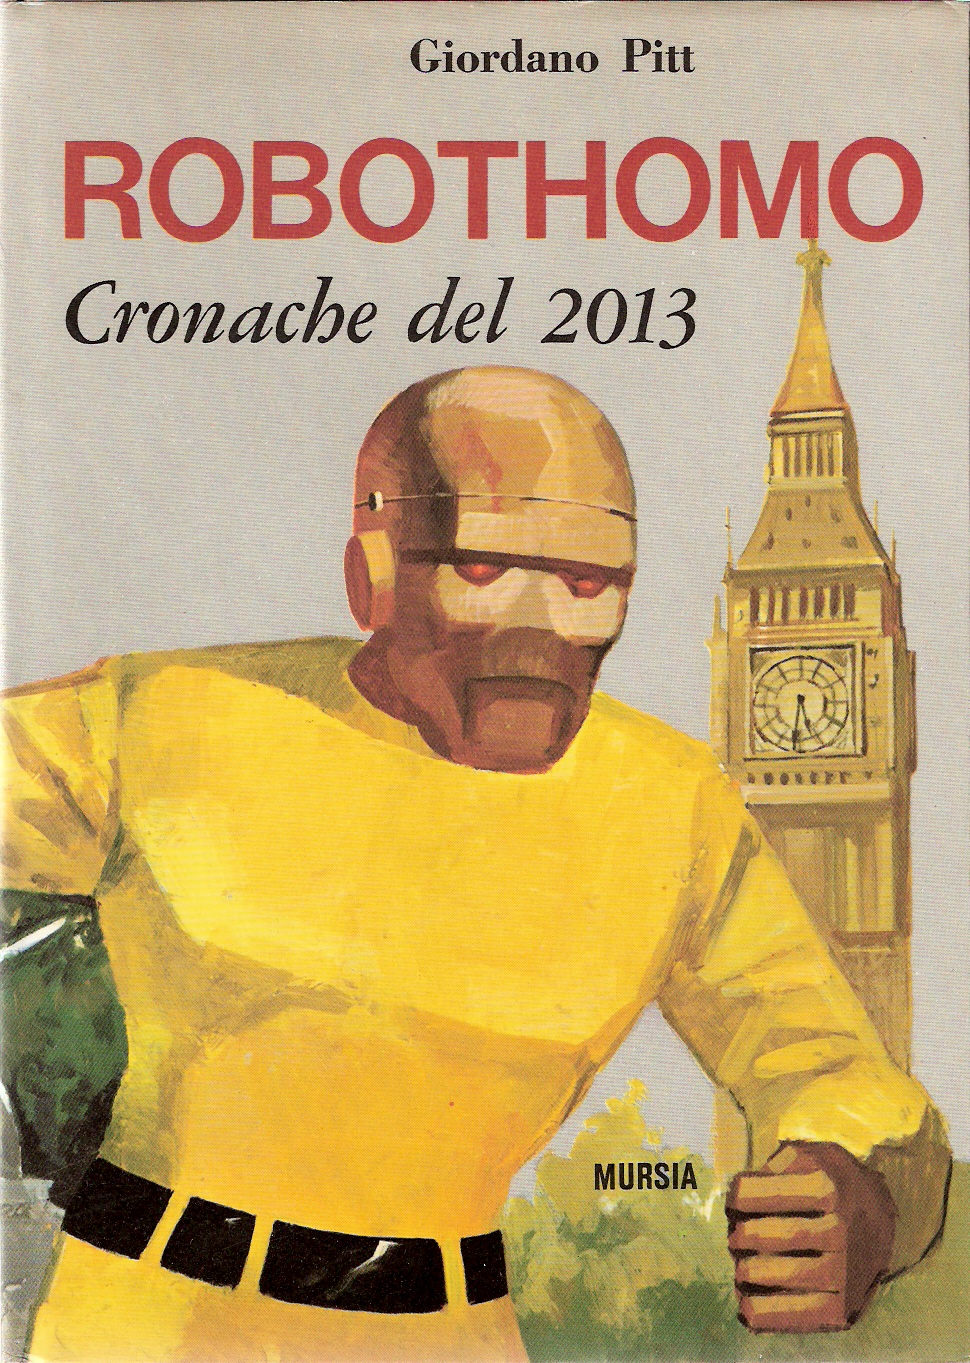 Robothomo